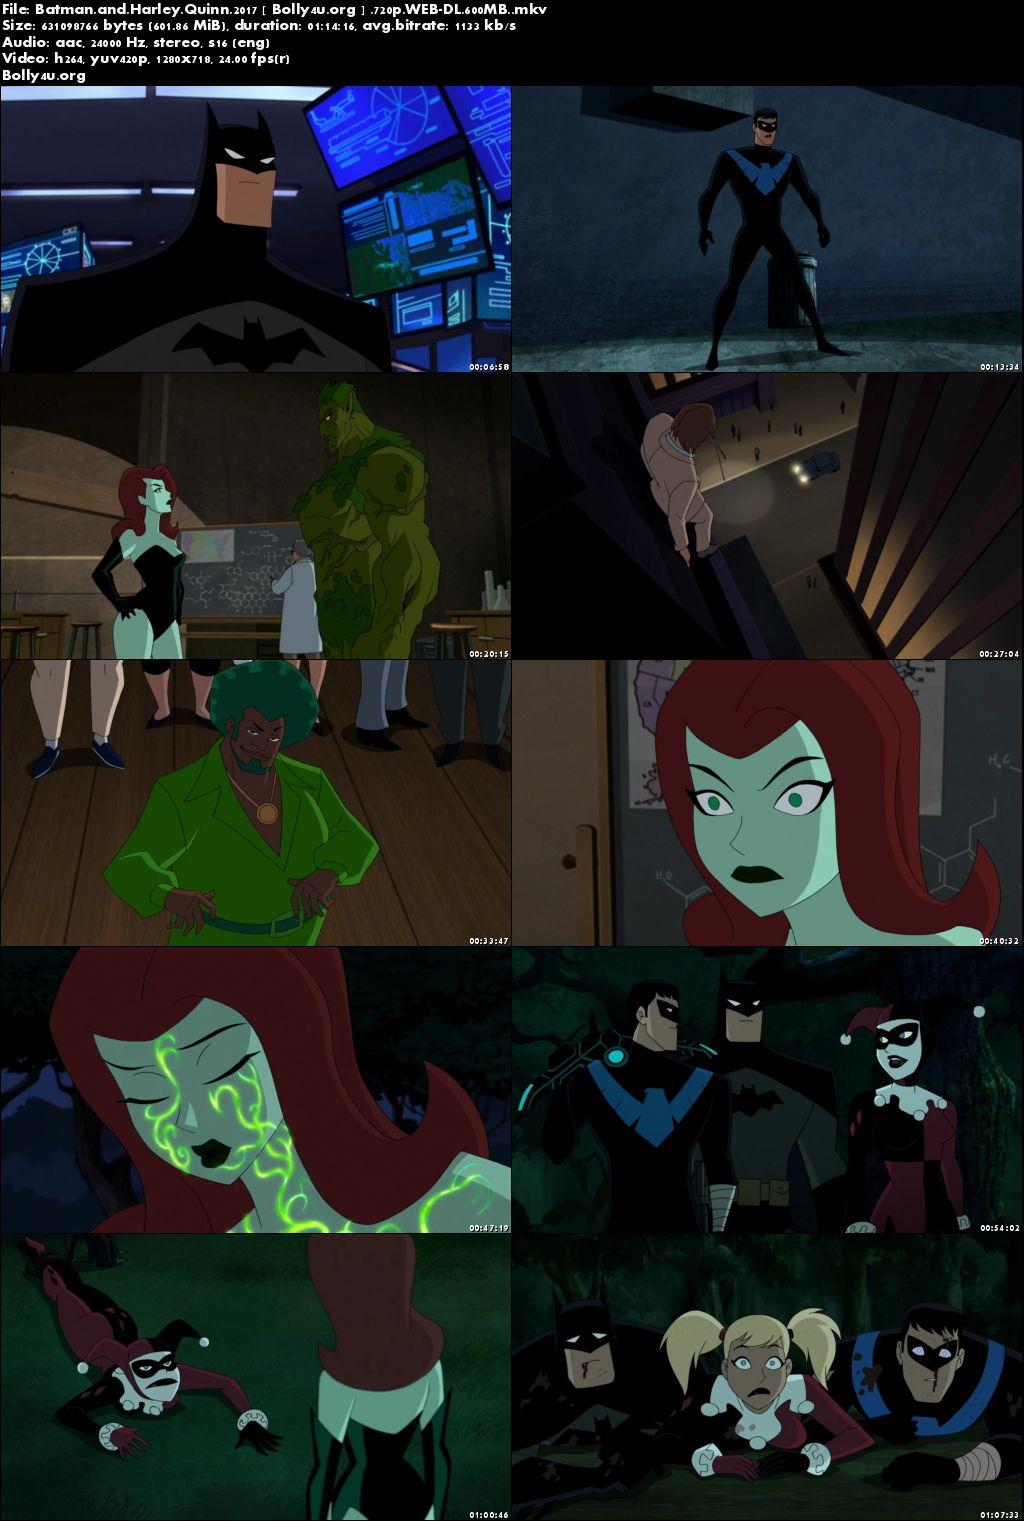 Batman and Harley Quinn 2017 WEB-DL 600Mb English 720p Download